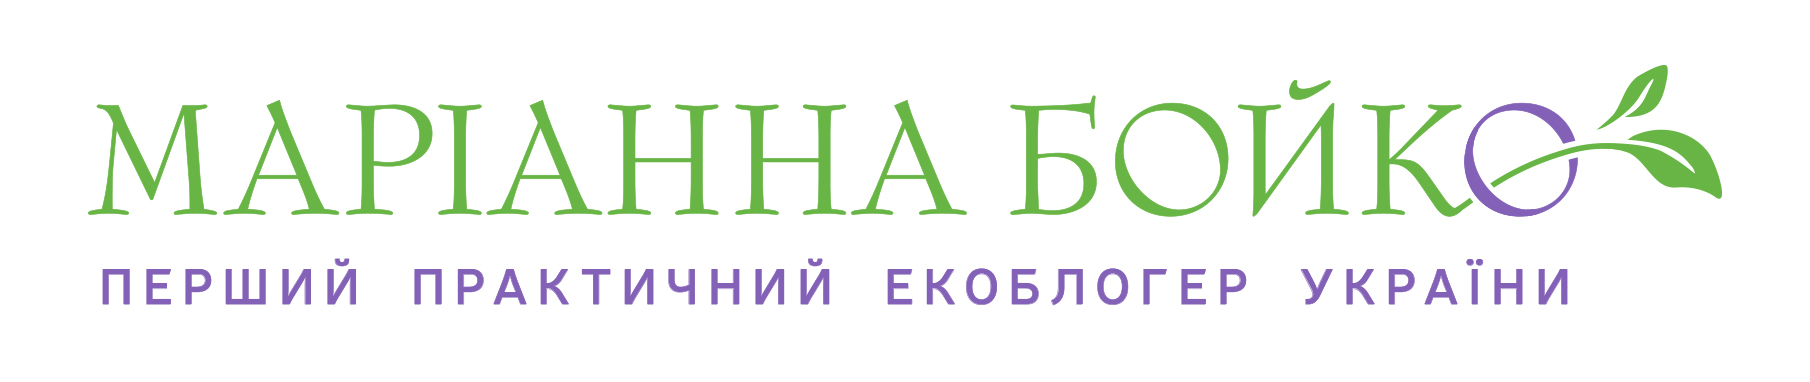 Маріанна Бойко – перший практичний екоблогер України